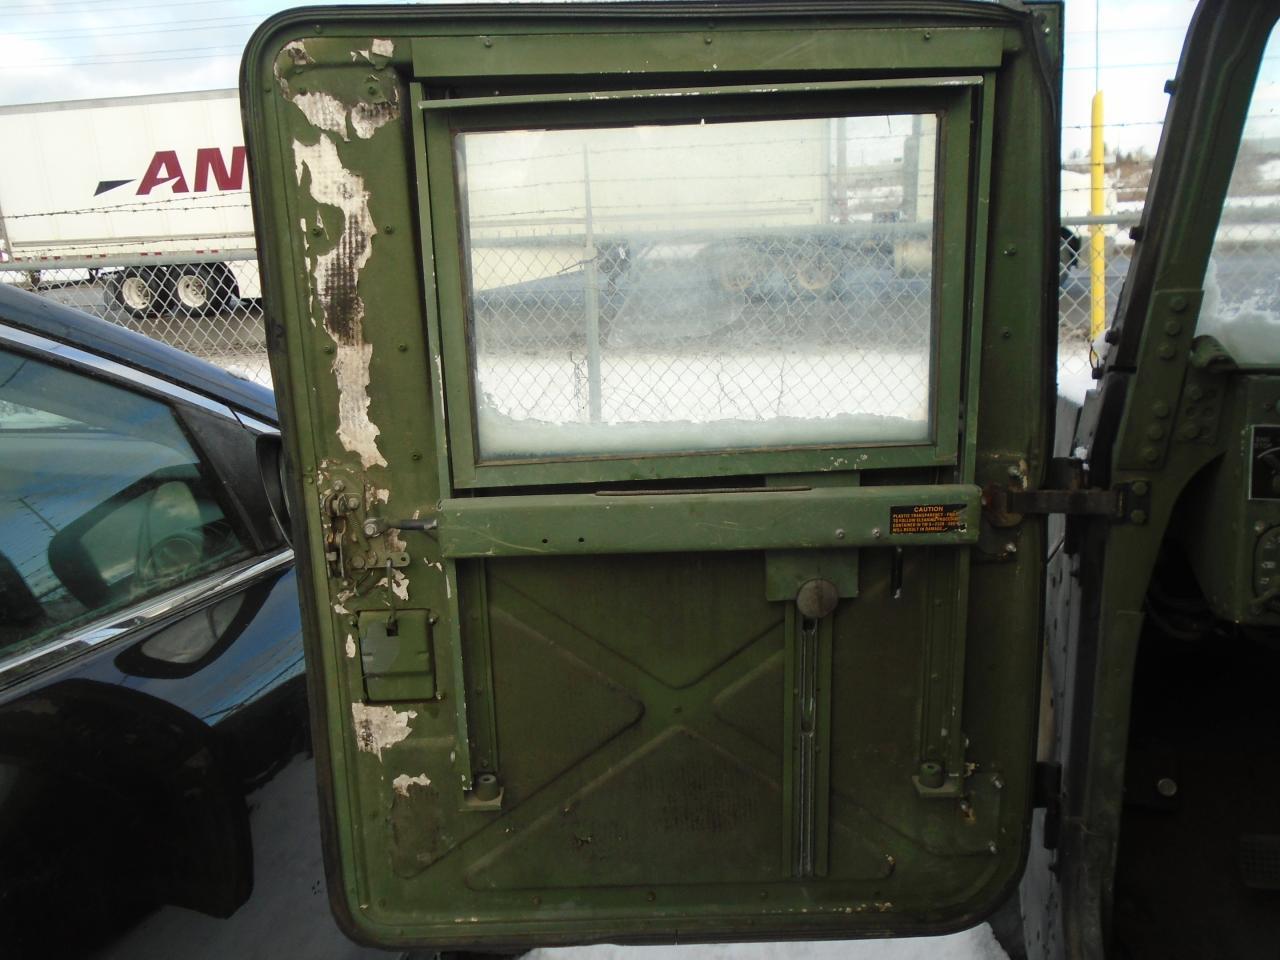 2002 Hummer Humvee